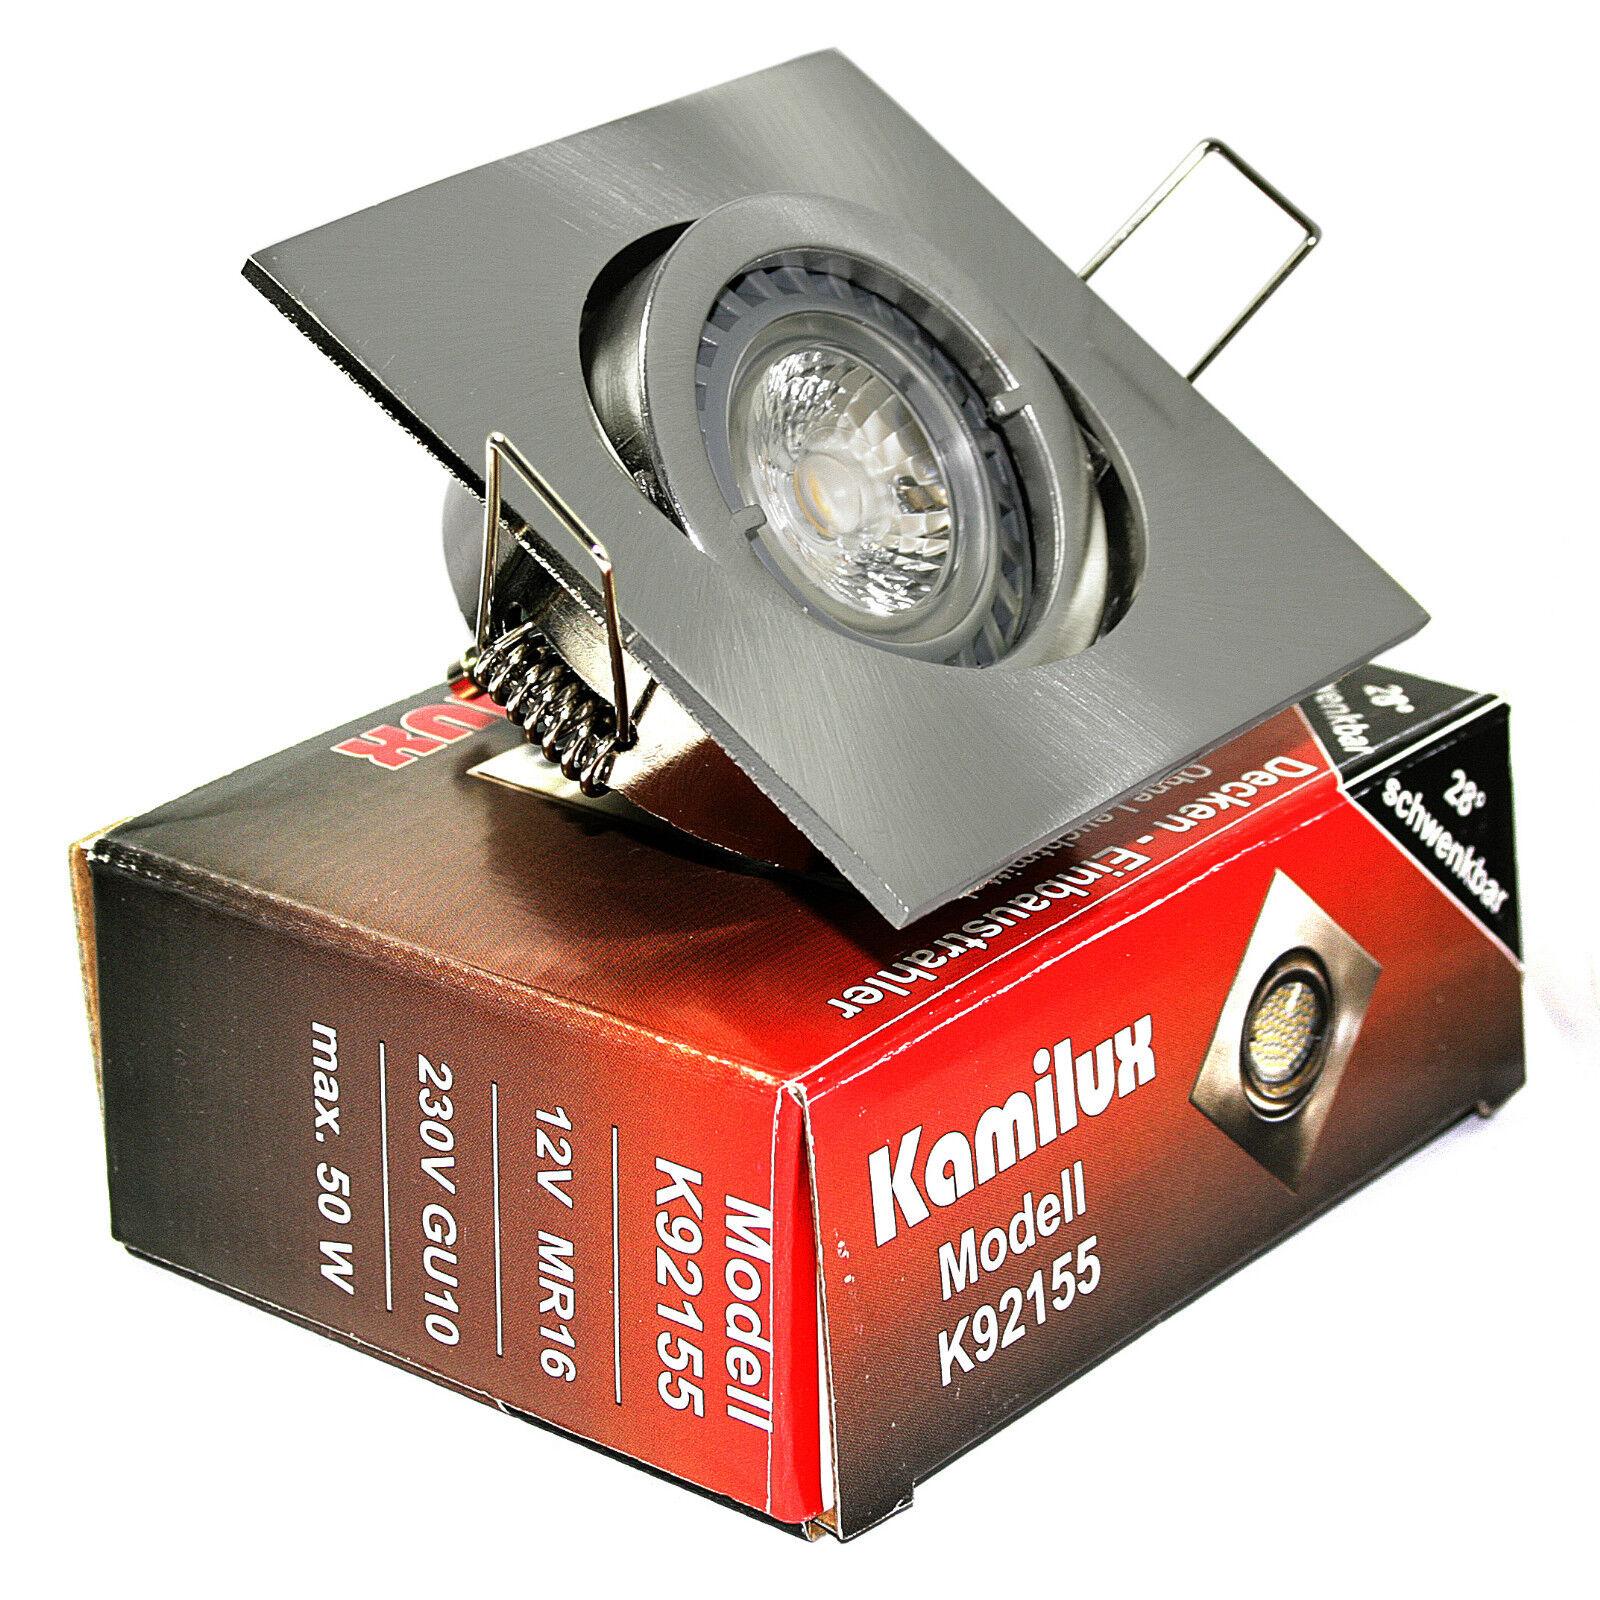 12v LED 5 Watt Watt Watt DA INCASSO FARETTO quajo incl. LAMPADINA bassa volt mr16 gu5.3 b1ad1a